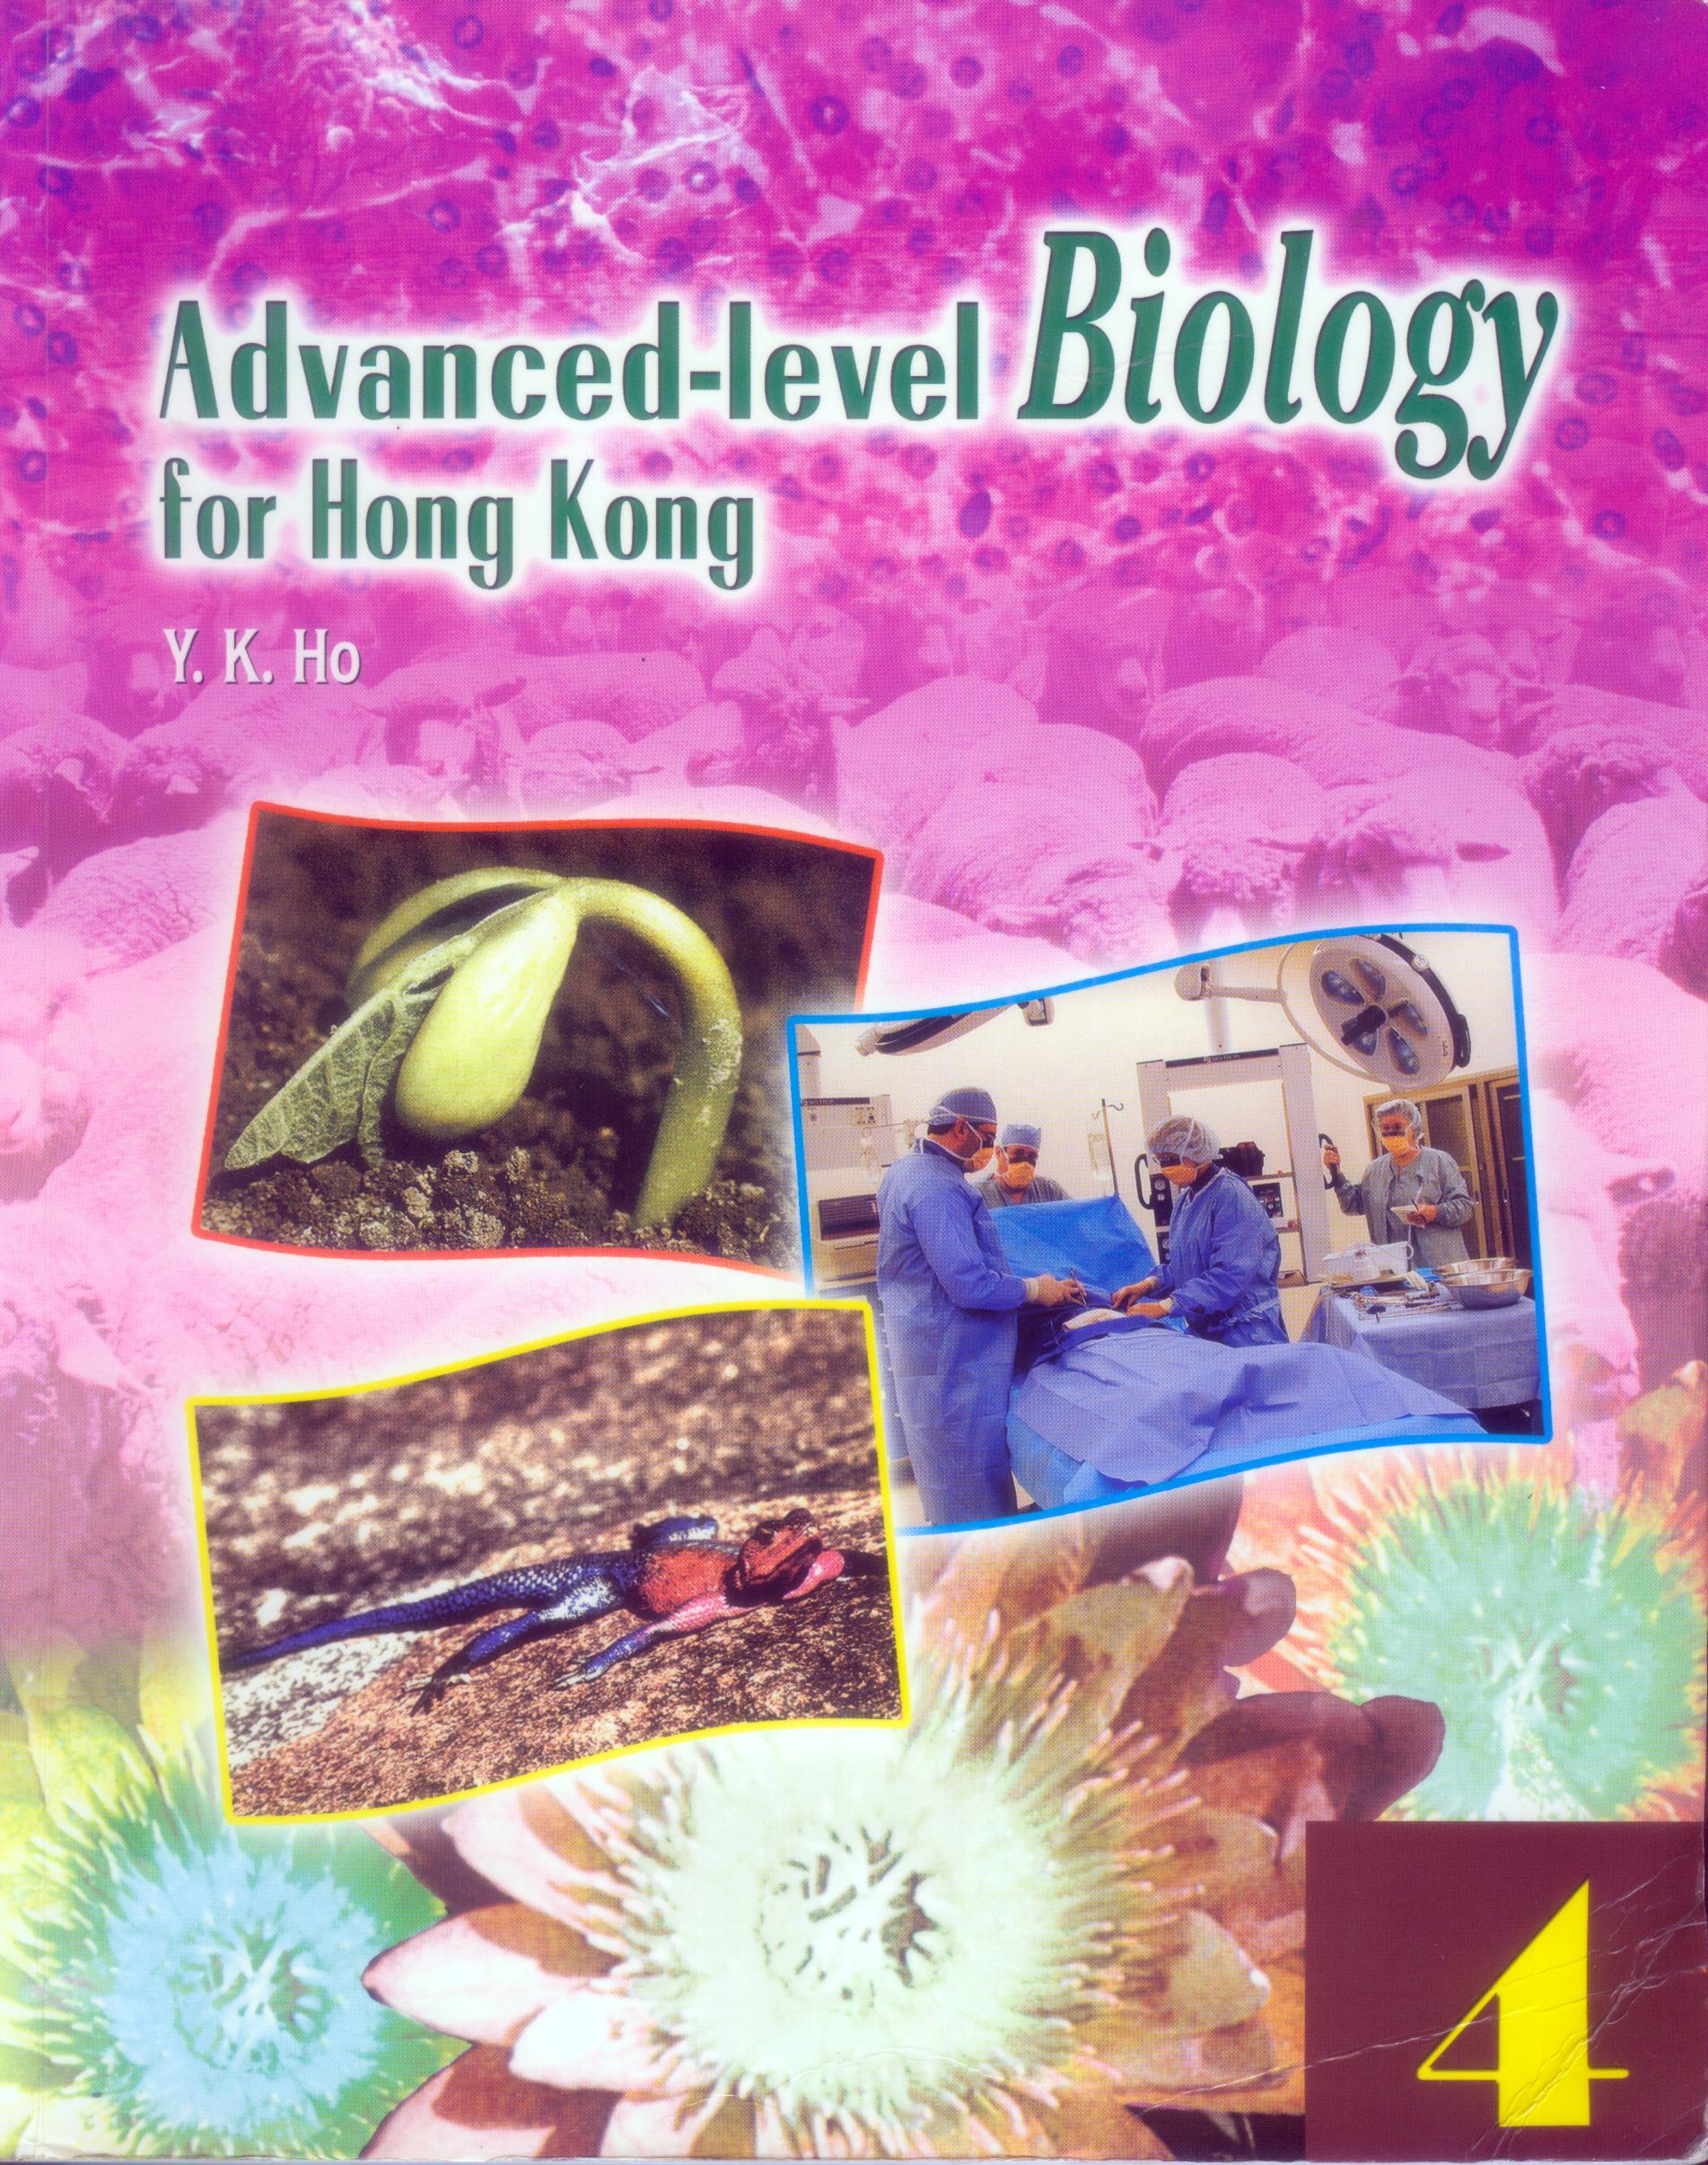 Advanced Level Biology for HK Vol.4